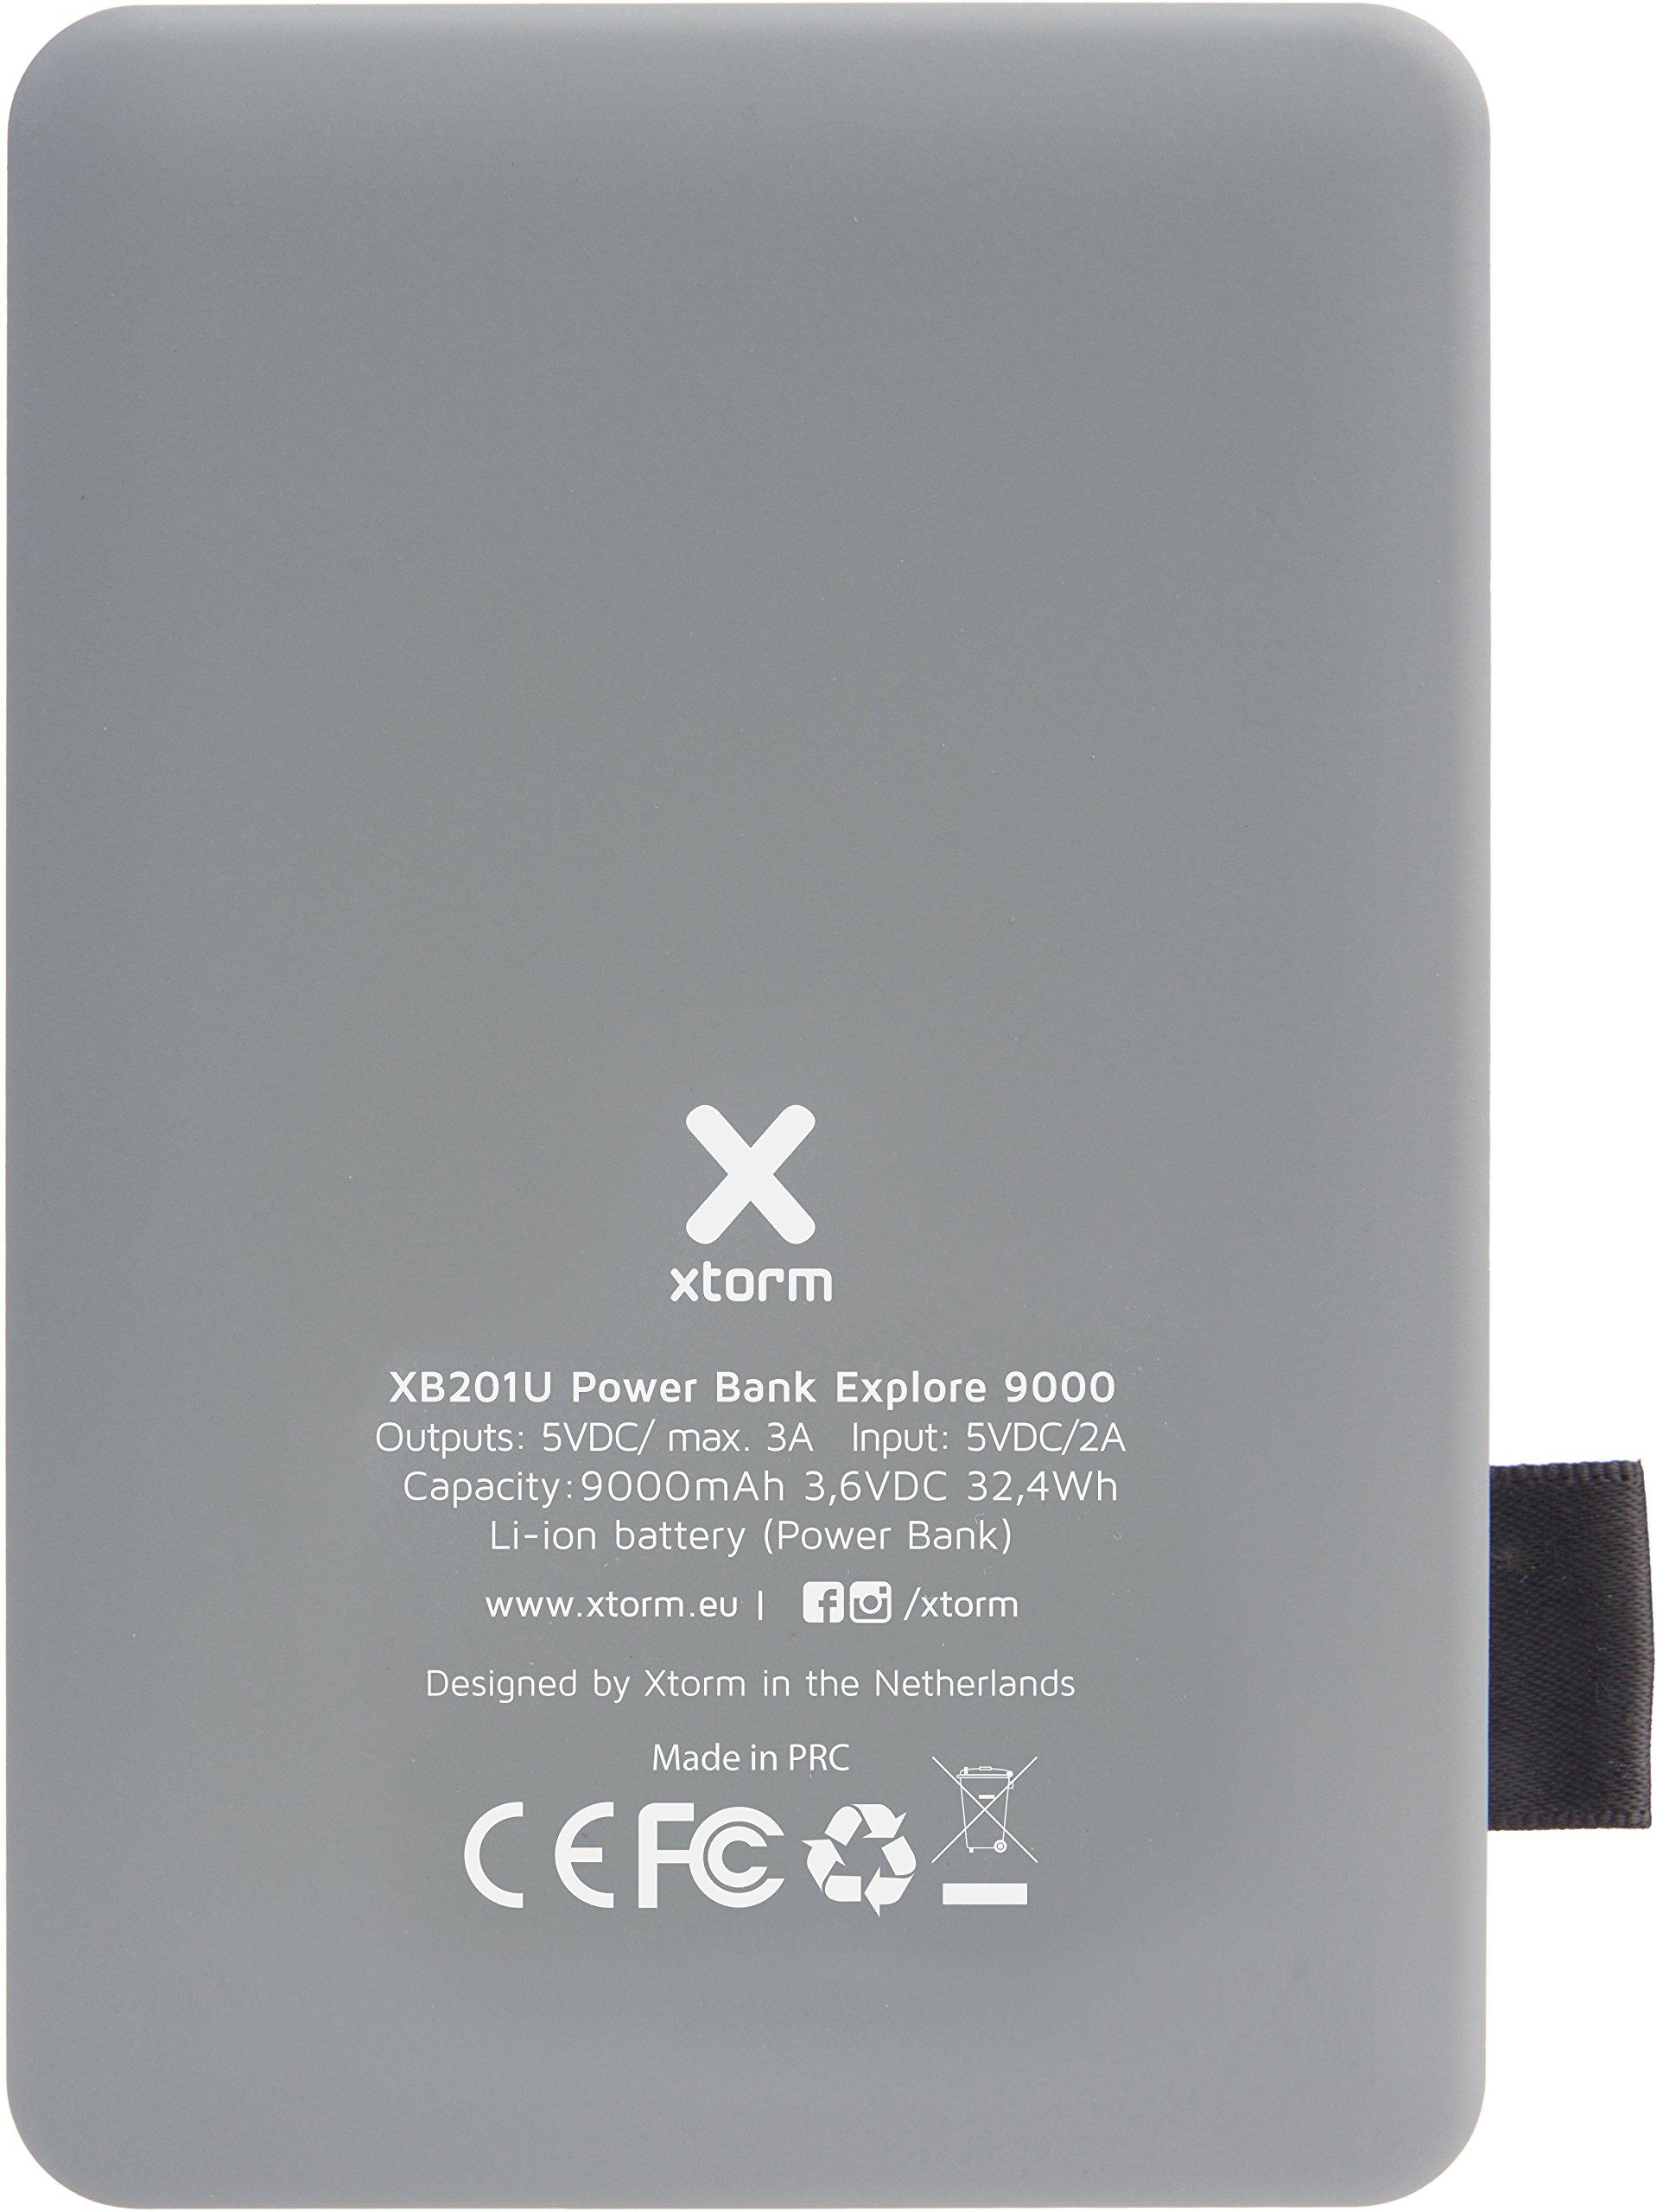 Xtorm xb201u Power Bank Explore (9,000 mAh, 2.4 A Out, 2 x